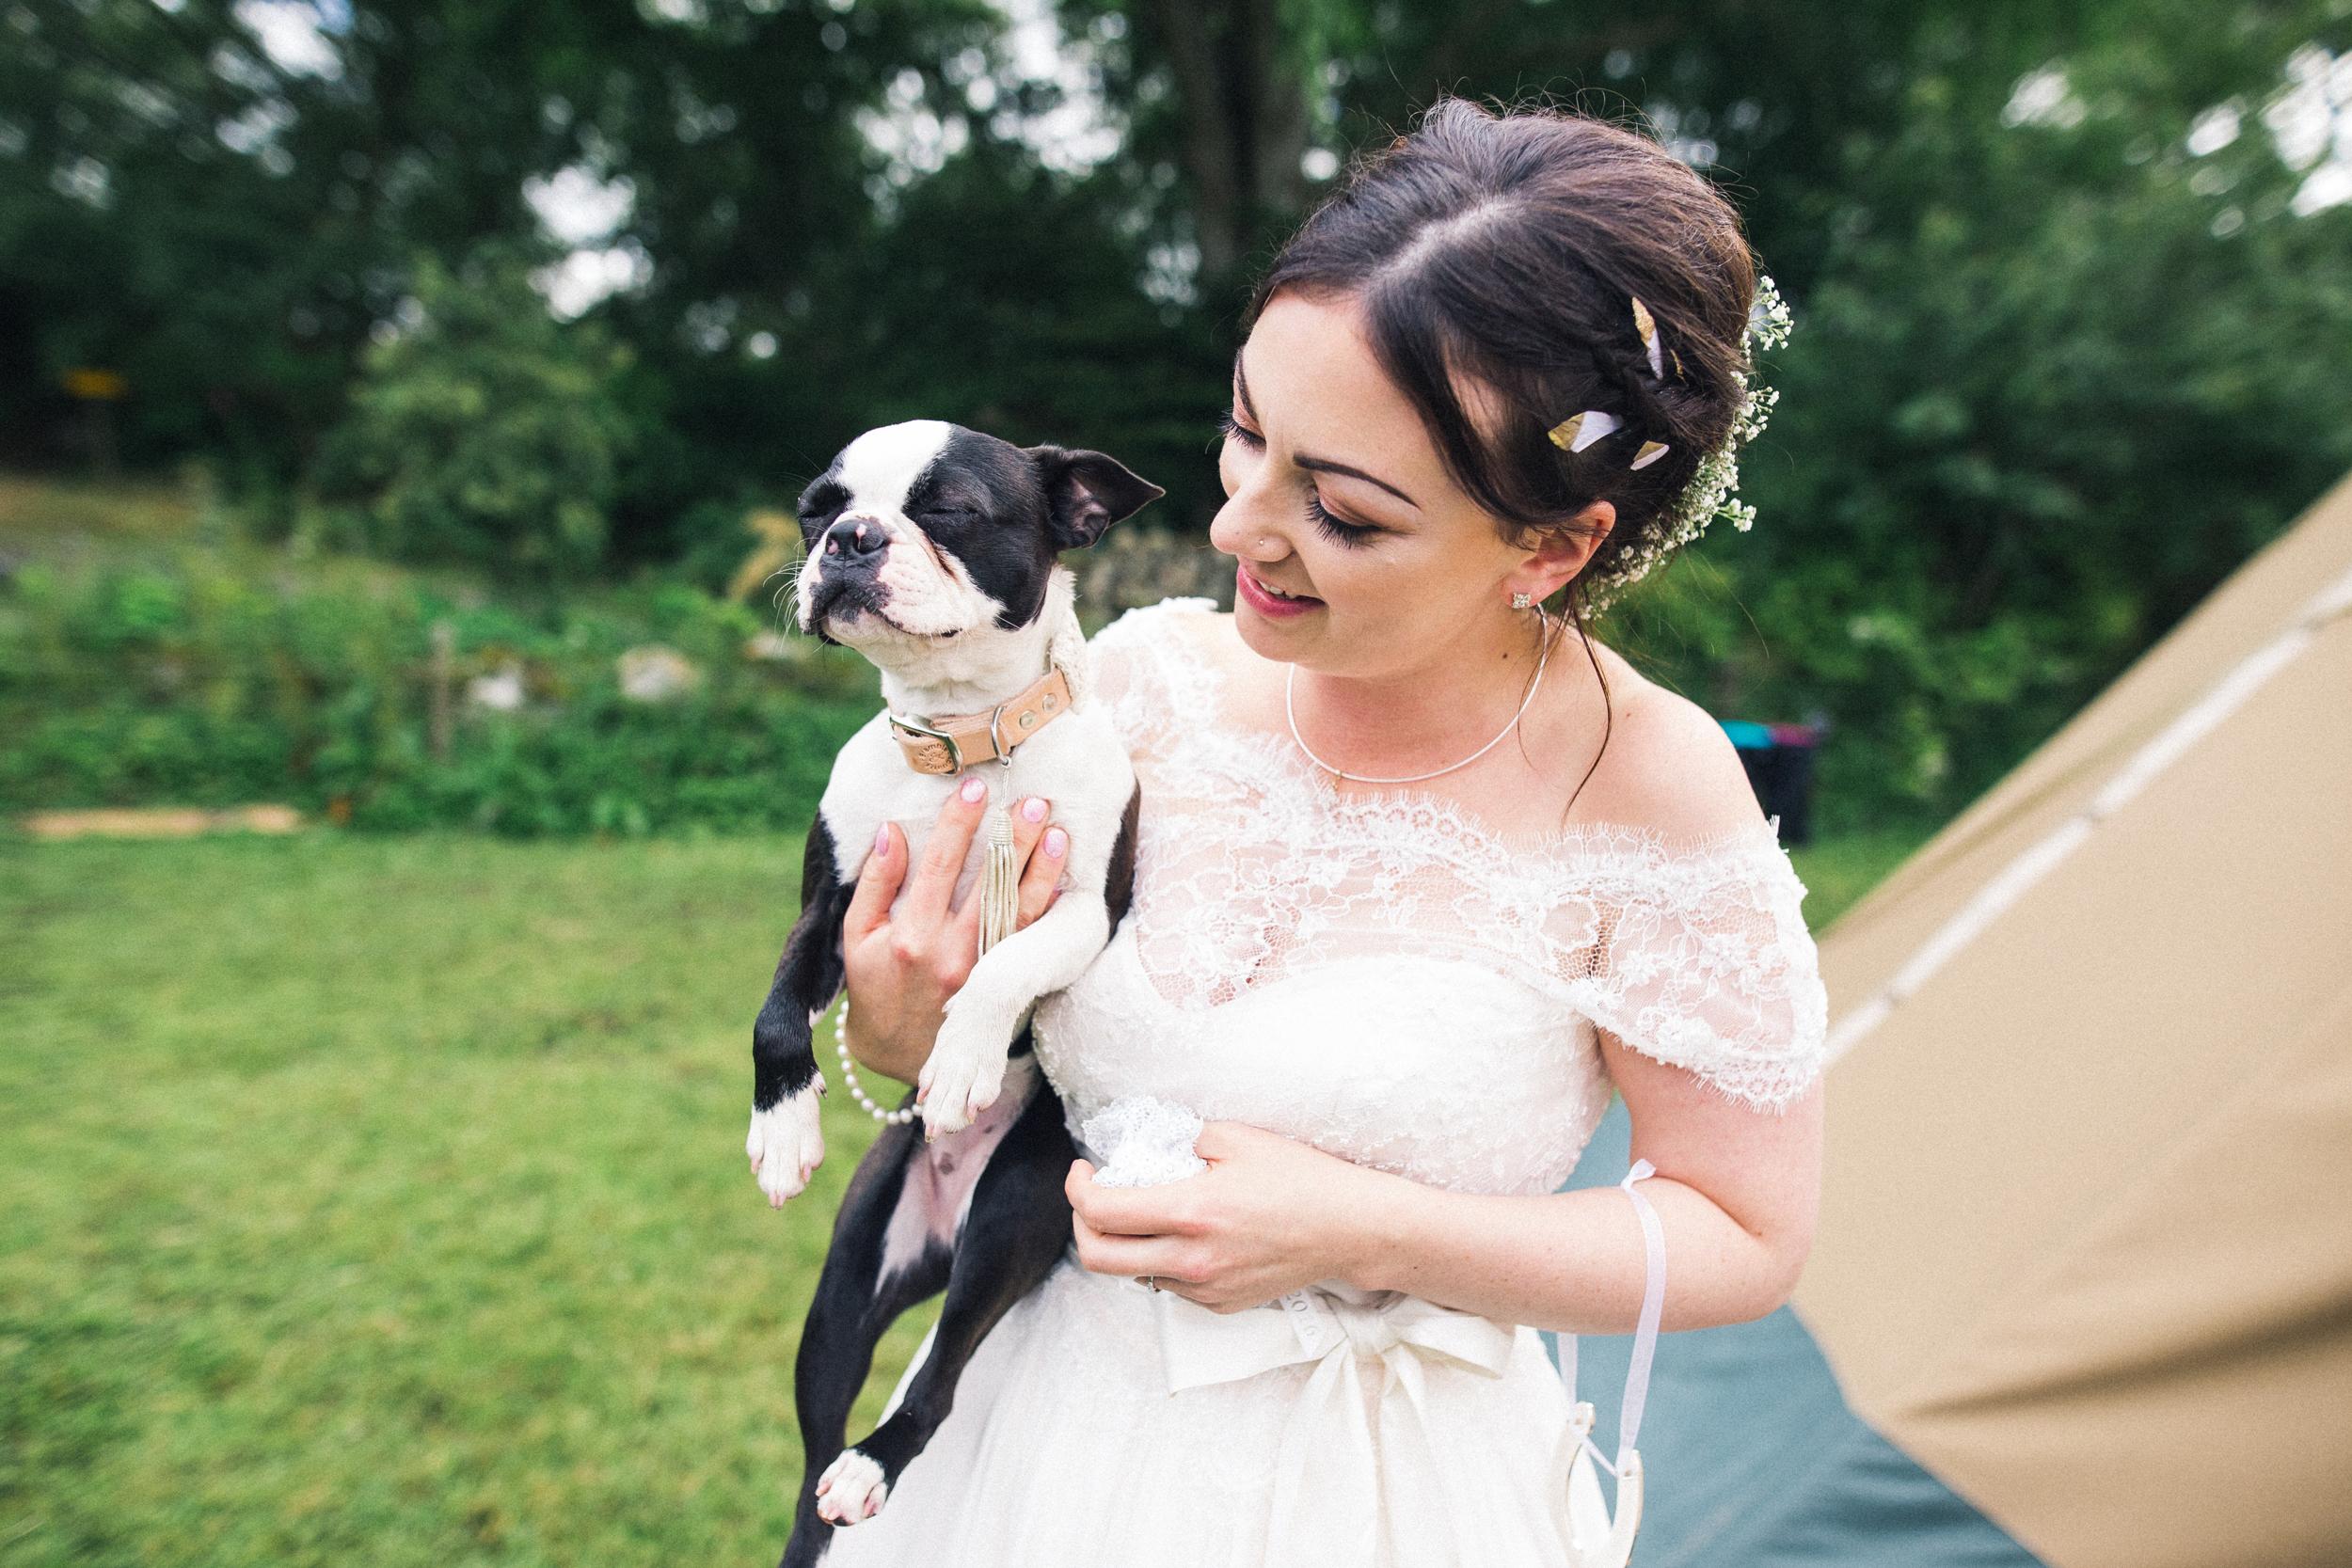 creative-wedding-photography-teesside-north-east-yorkshire-98.jpg